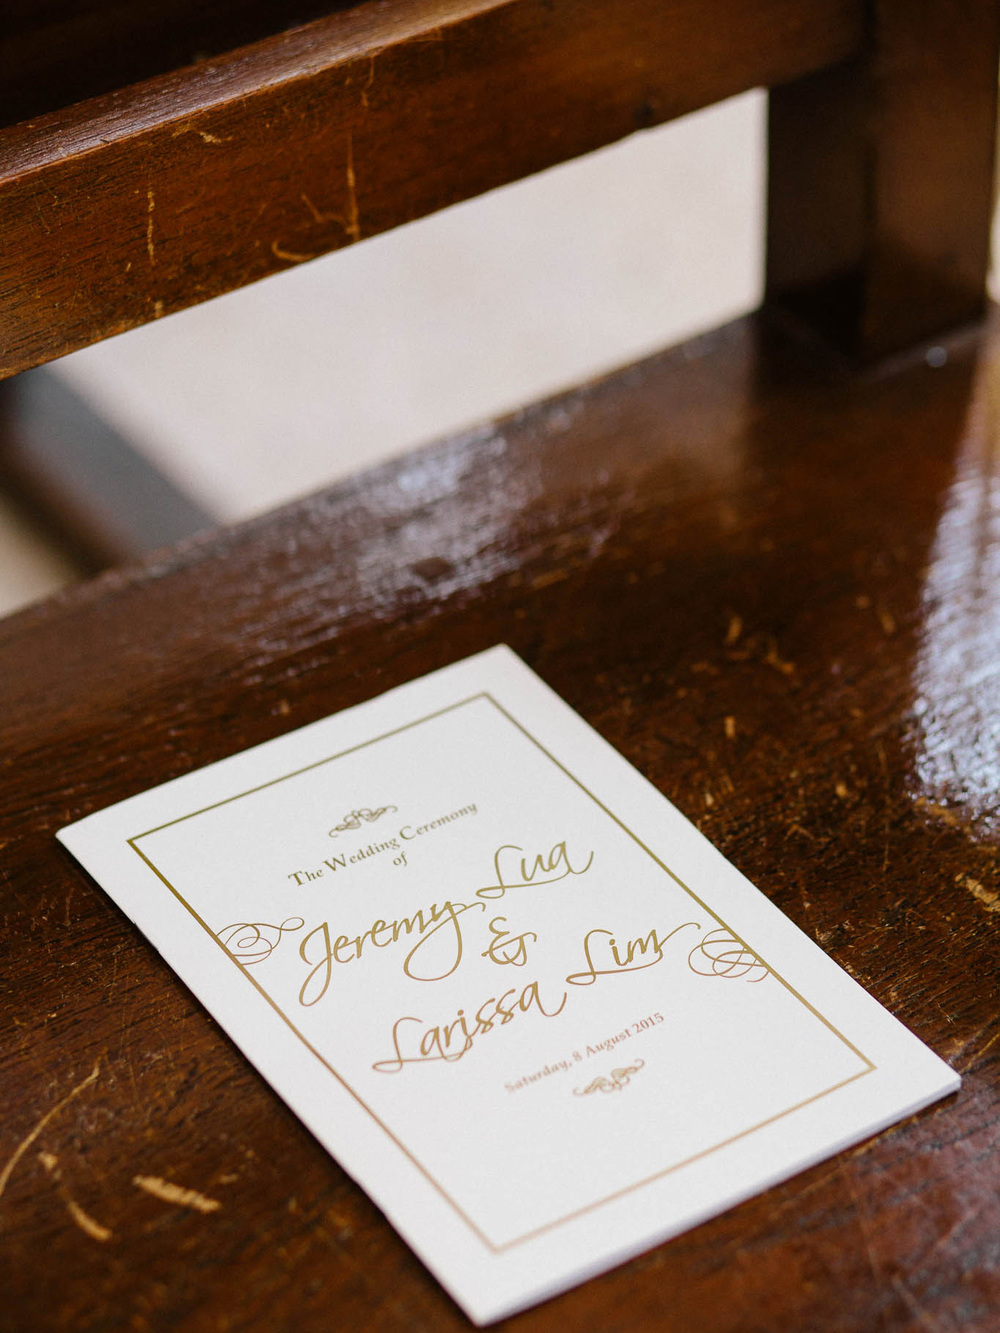 singapore-wedding-photographer-malay-indian-pre-wedding-travel-wmt-2015-jeremy-larissa-19.jpg